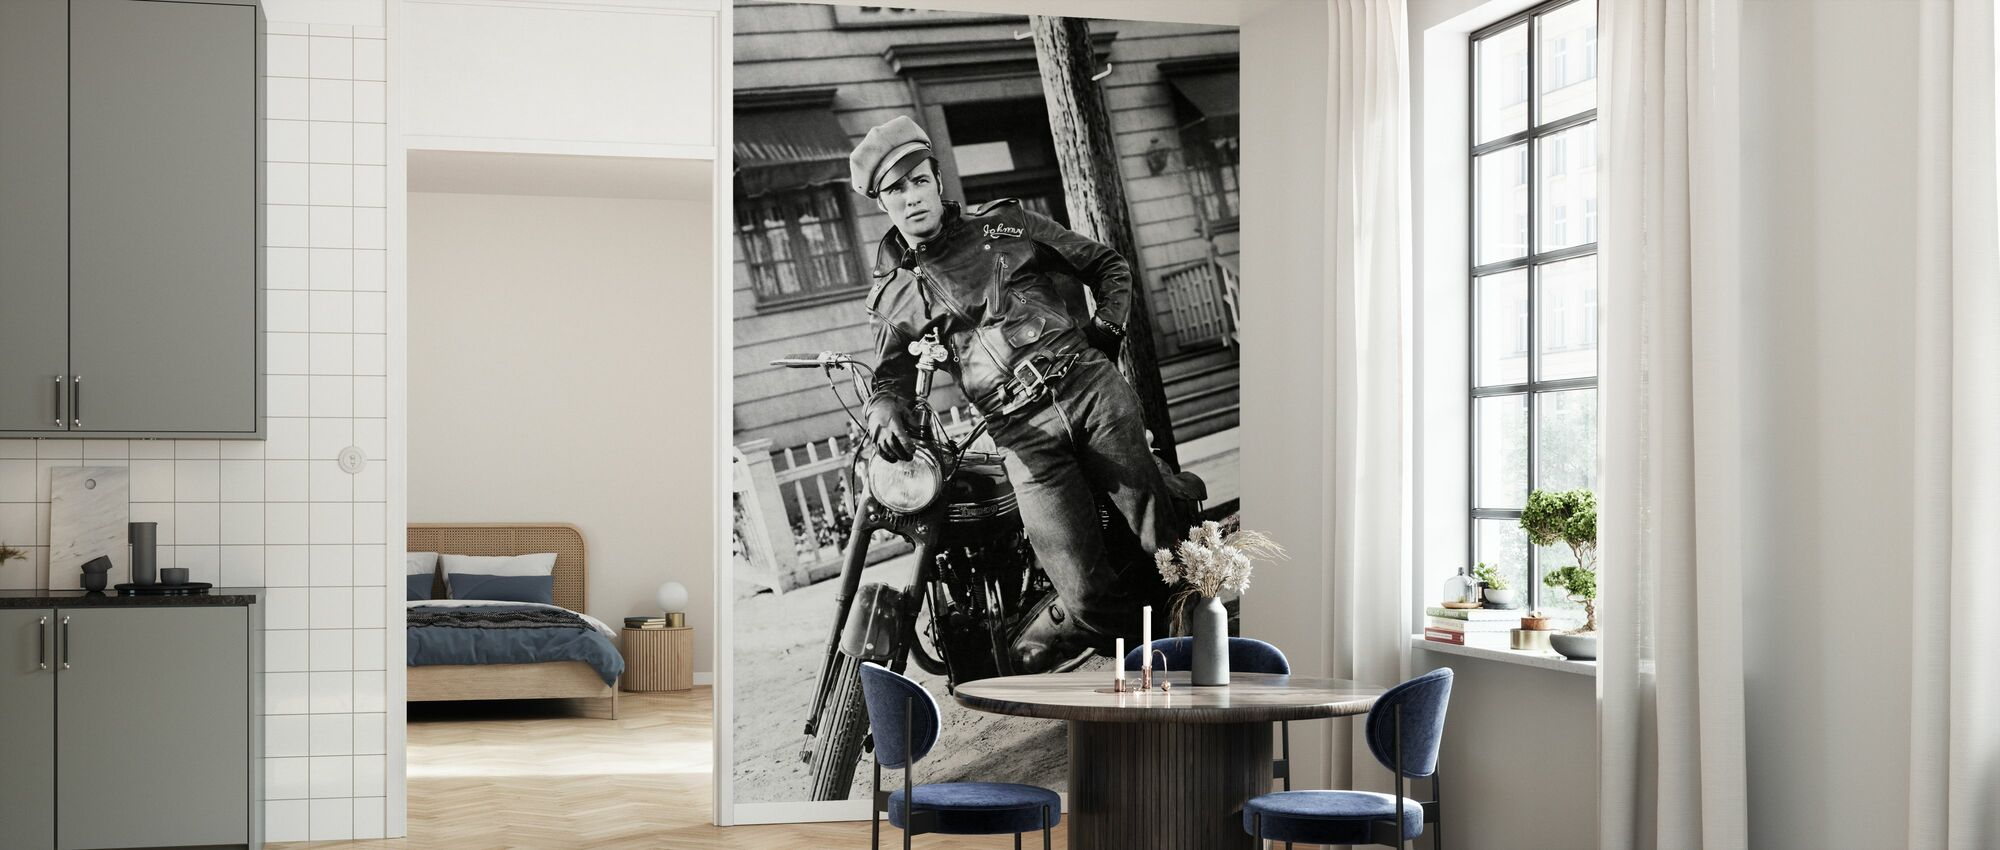 Marlon Brando in the Wild One - Wallpaper - Kitchen